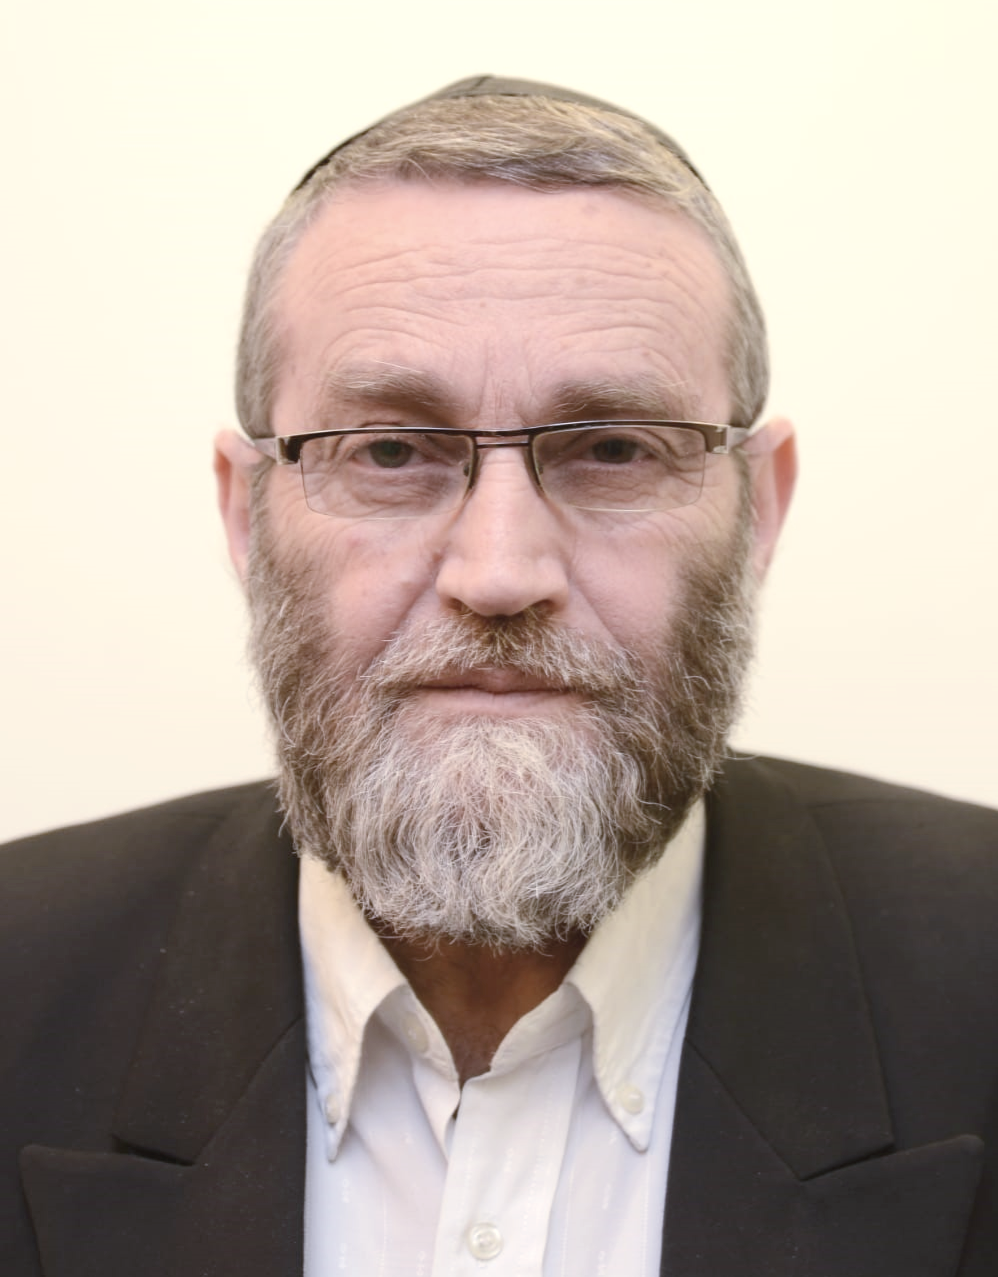 MK Rabbi Moshe Gafni